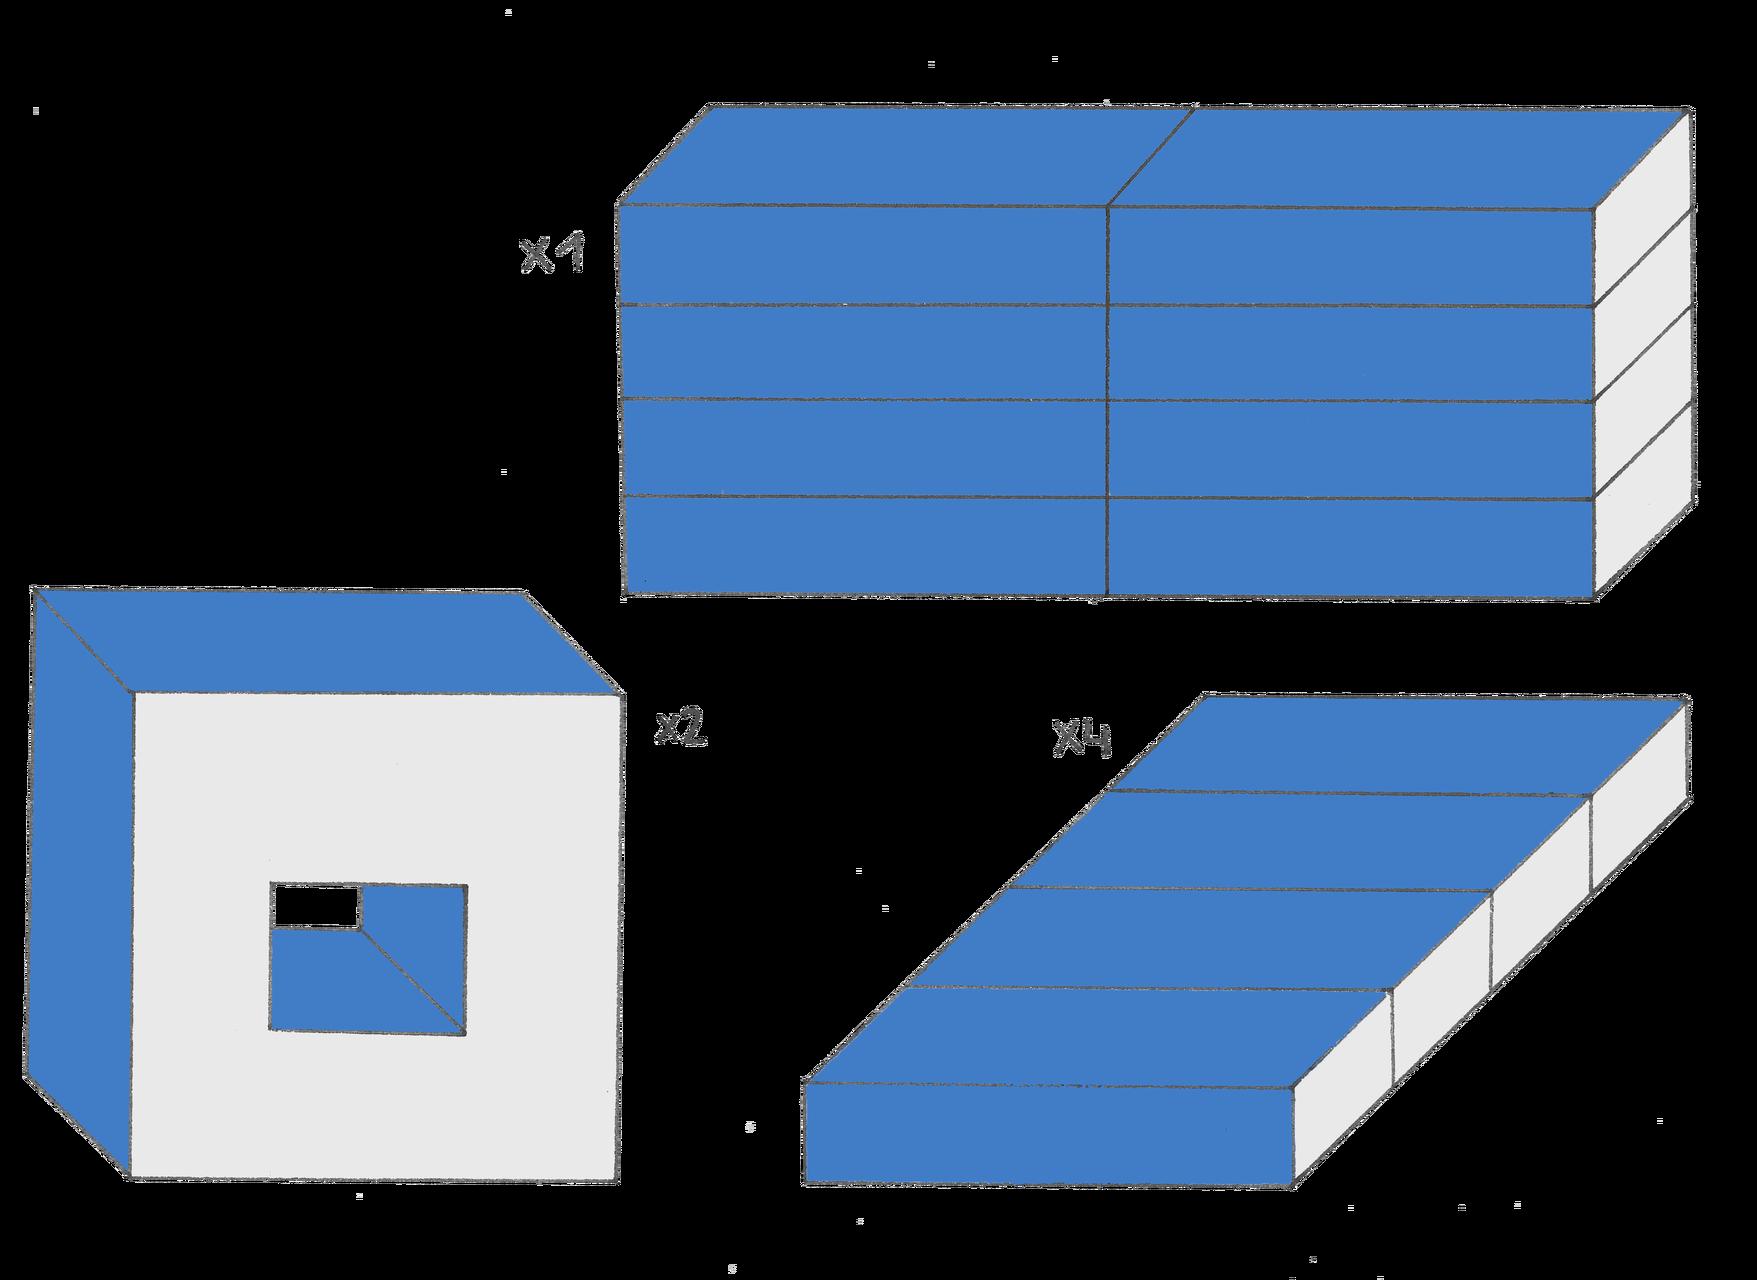 iconographie par les etudiants de manaa ort strasbourg 2015 2016 site de ort manaa. Black Bedroom Furniture Sets. Home Design Ideas